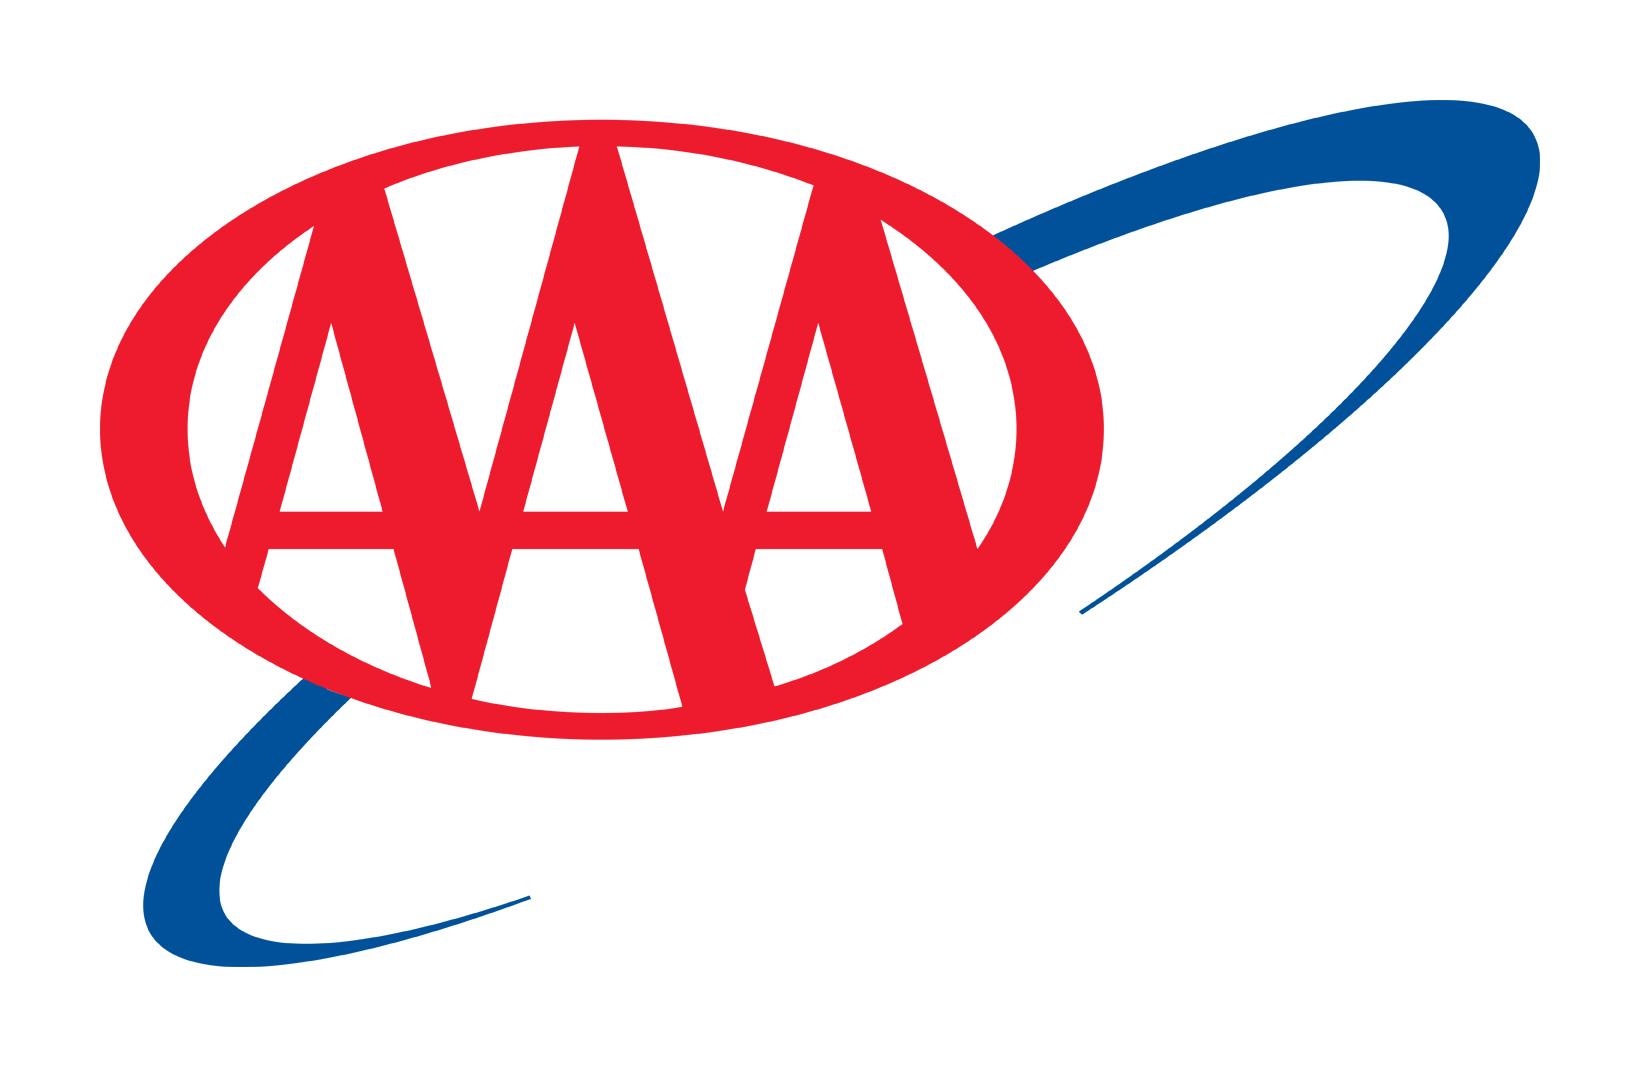 Radio spot for AAA